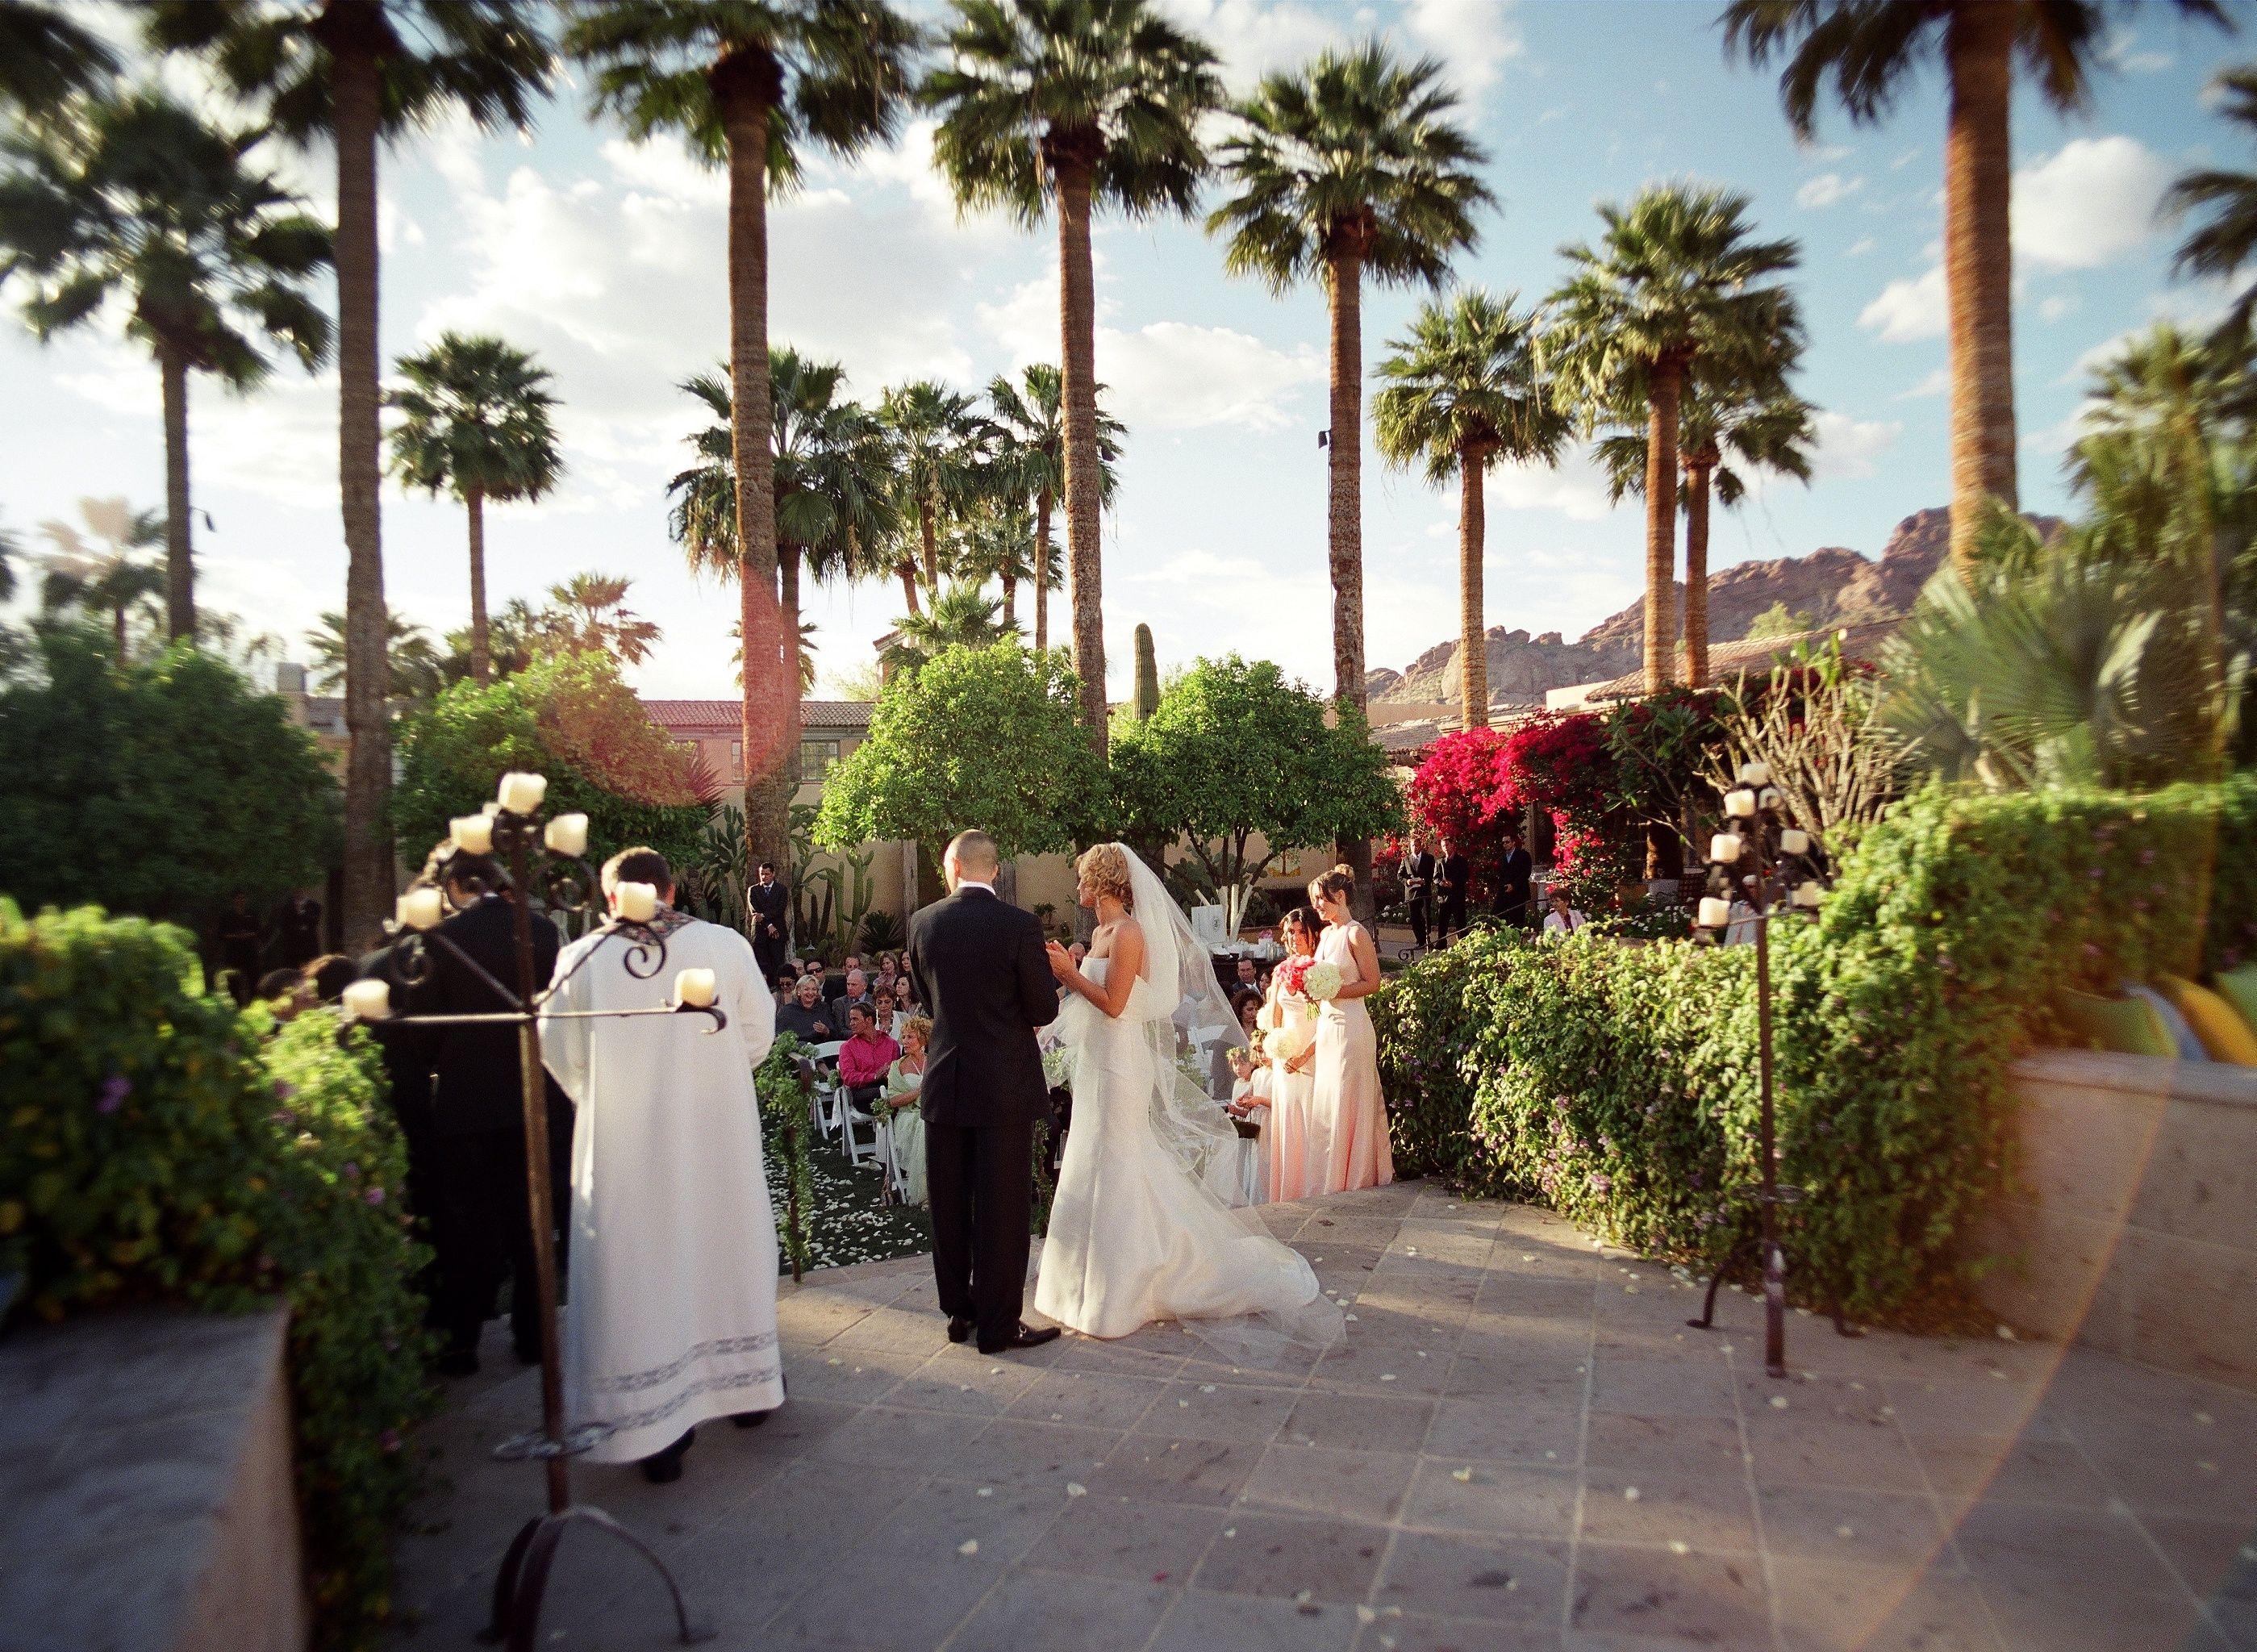 Stunning views for your extraordinary day. Vernadero Lawn Ceremony at Royal Palms Resort and Spa Christine Johnson Photography  Phoenix/Scottsdale Wedding venue http://www.royalpalmshotel.com/weddings/phoenix-arizona-weddings